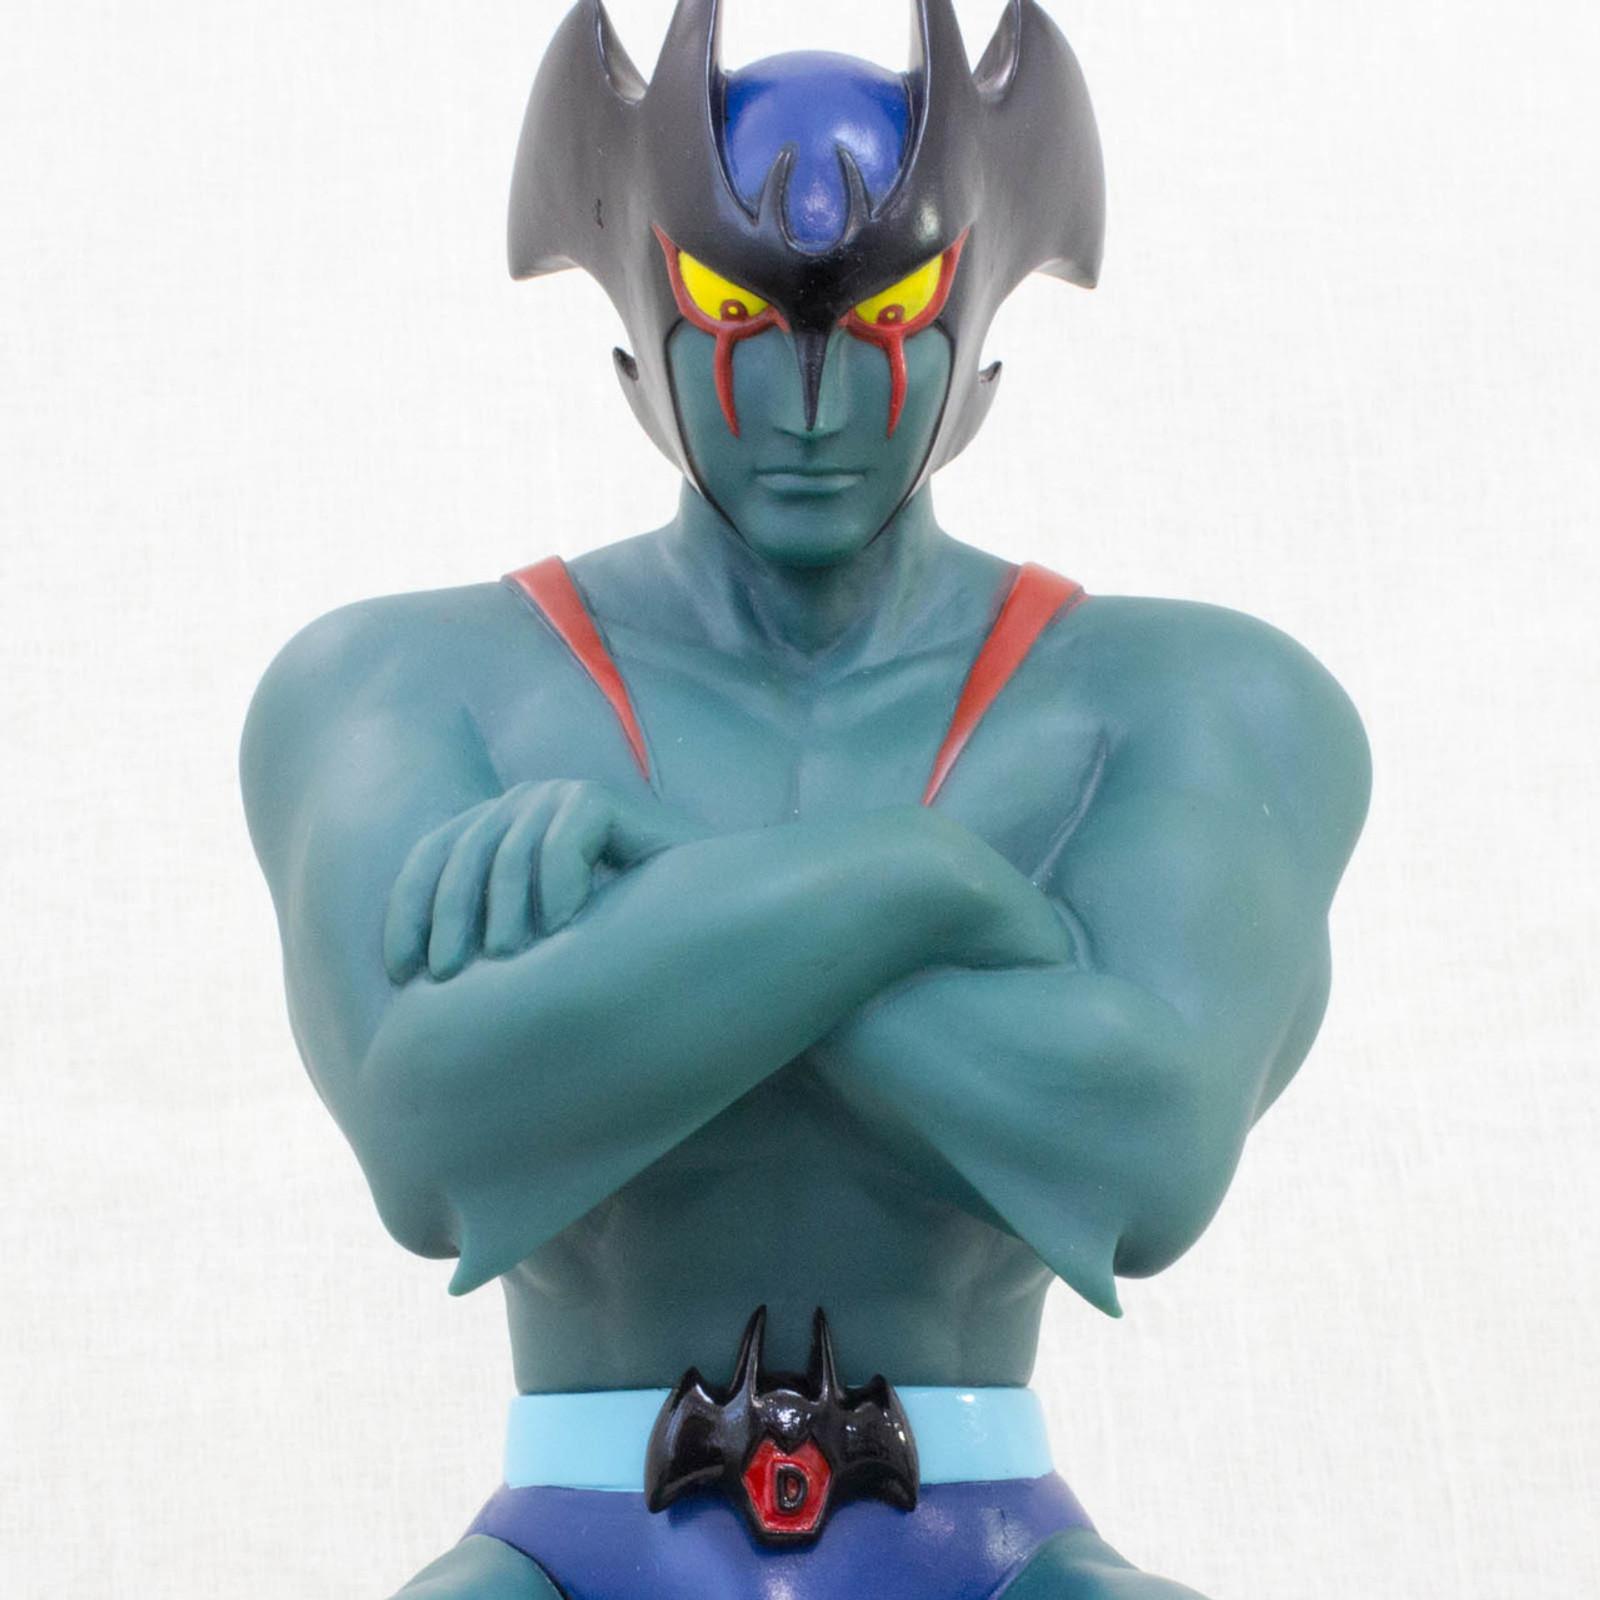 RARE! Devilman Anime Ending Sitting Ver. Big Soft Vinyl Figure JAPAN ANIME MANGA